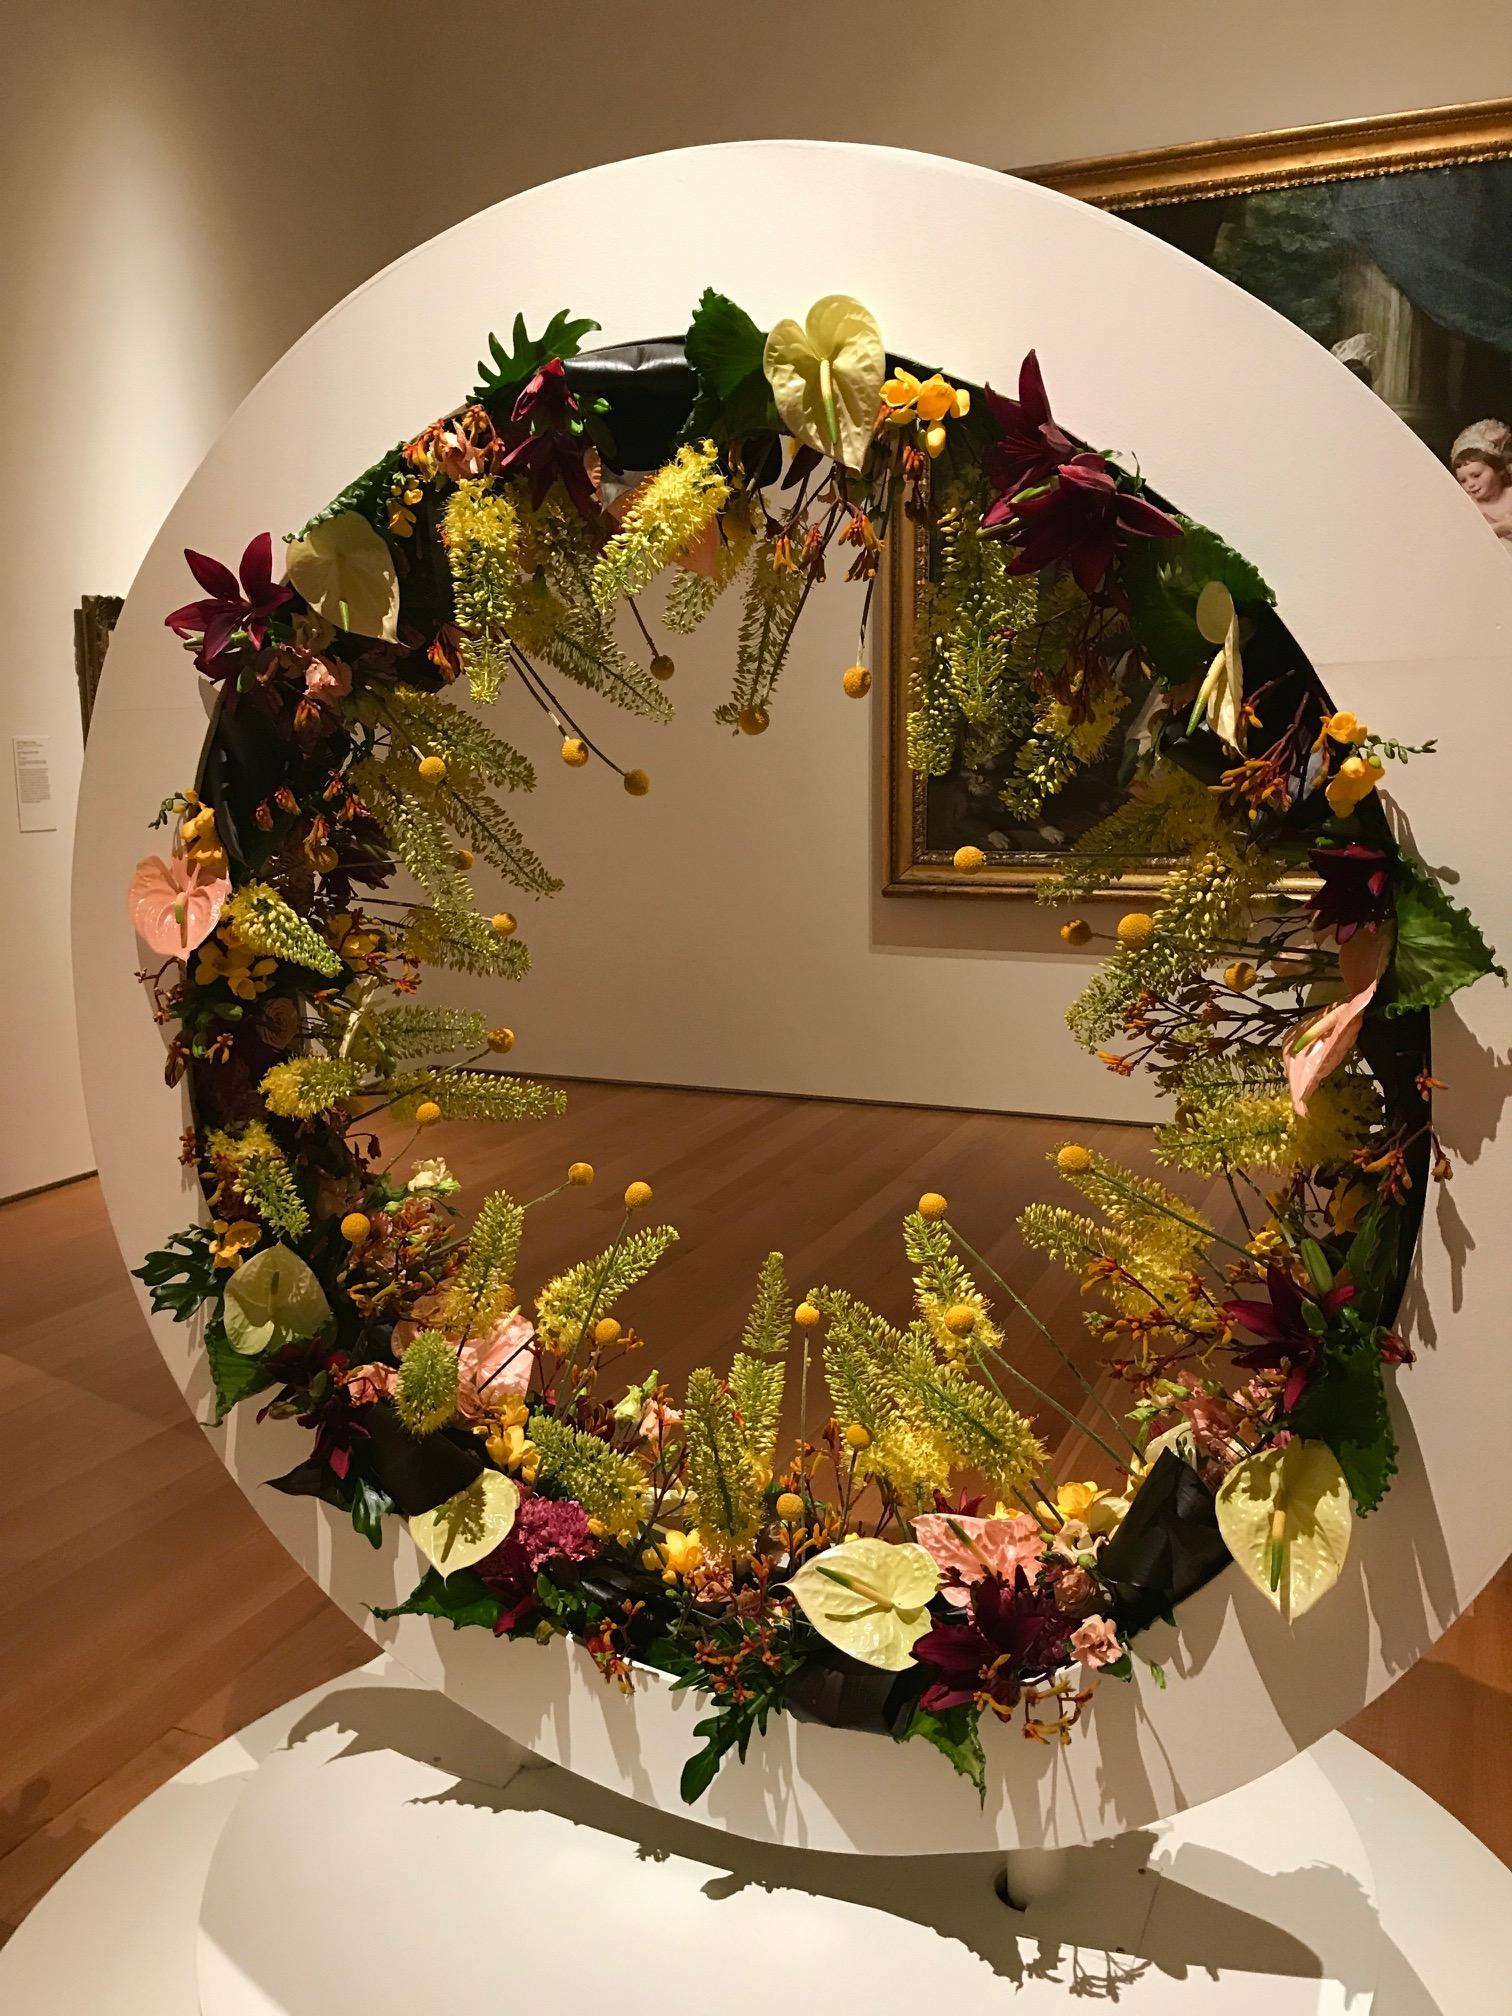 <div class='meta'><div class='origin-logo' data-origin='WTVD'></div><span class='caption-text' data-credit='Caroline F. Welch'>The Art in Bloom event celebrates the start of spring.</span></div>